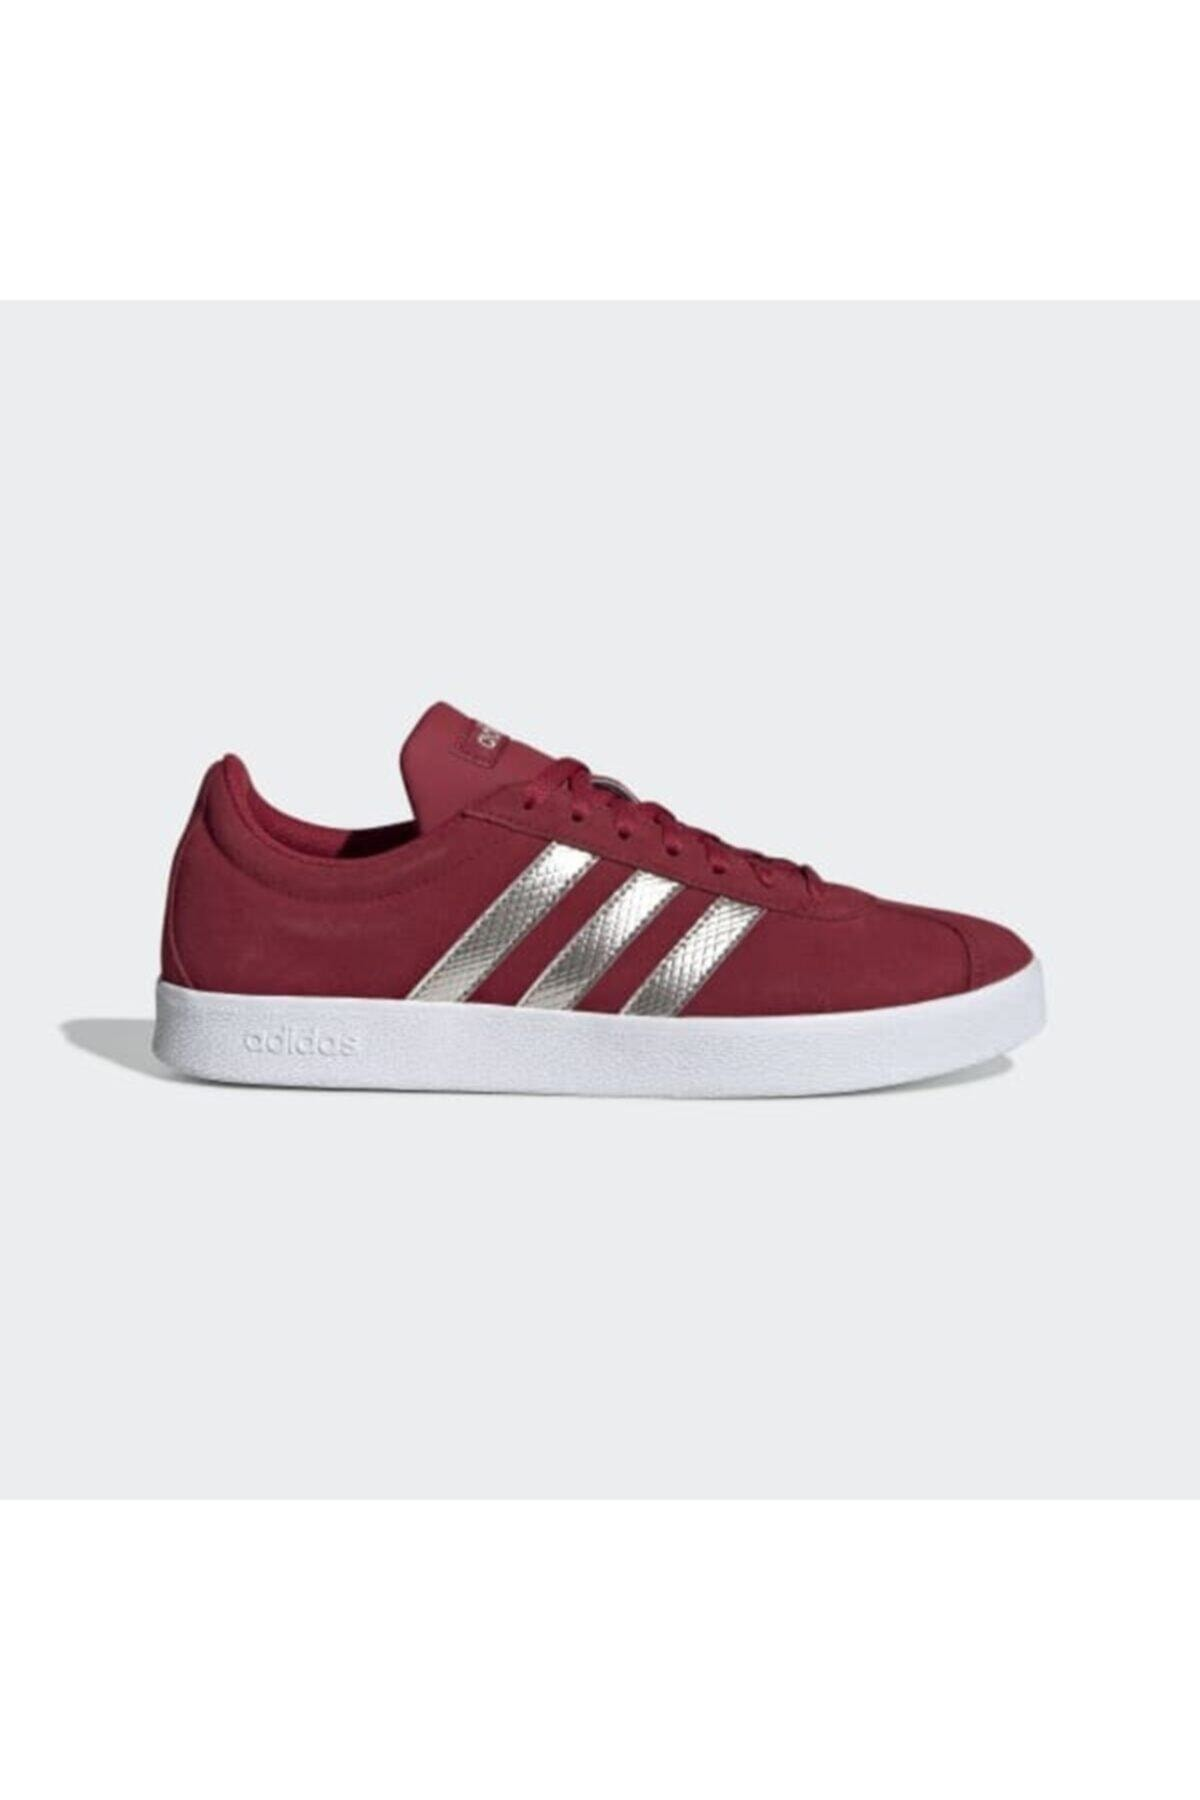 adidas Vl Court 2.0 Ee6785 1